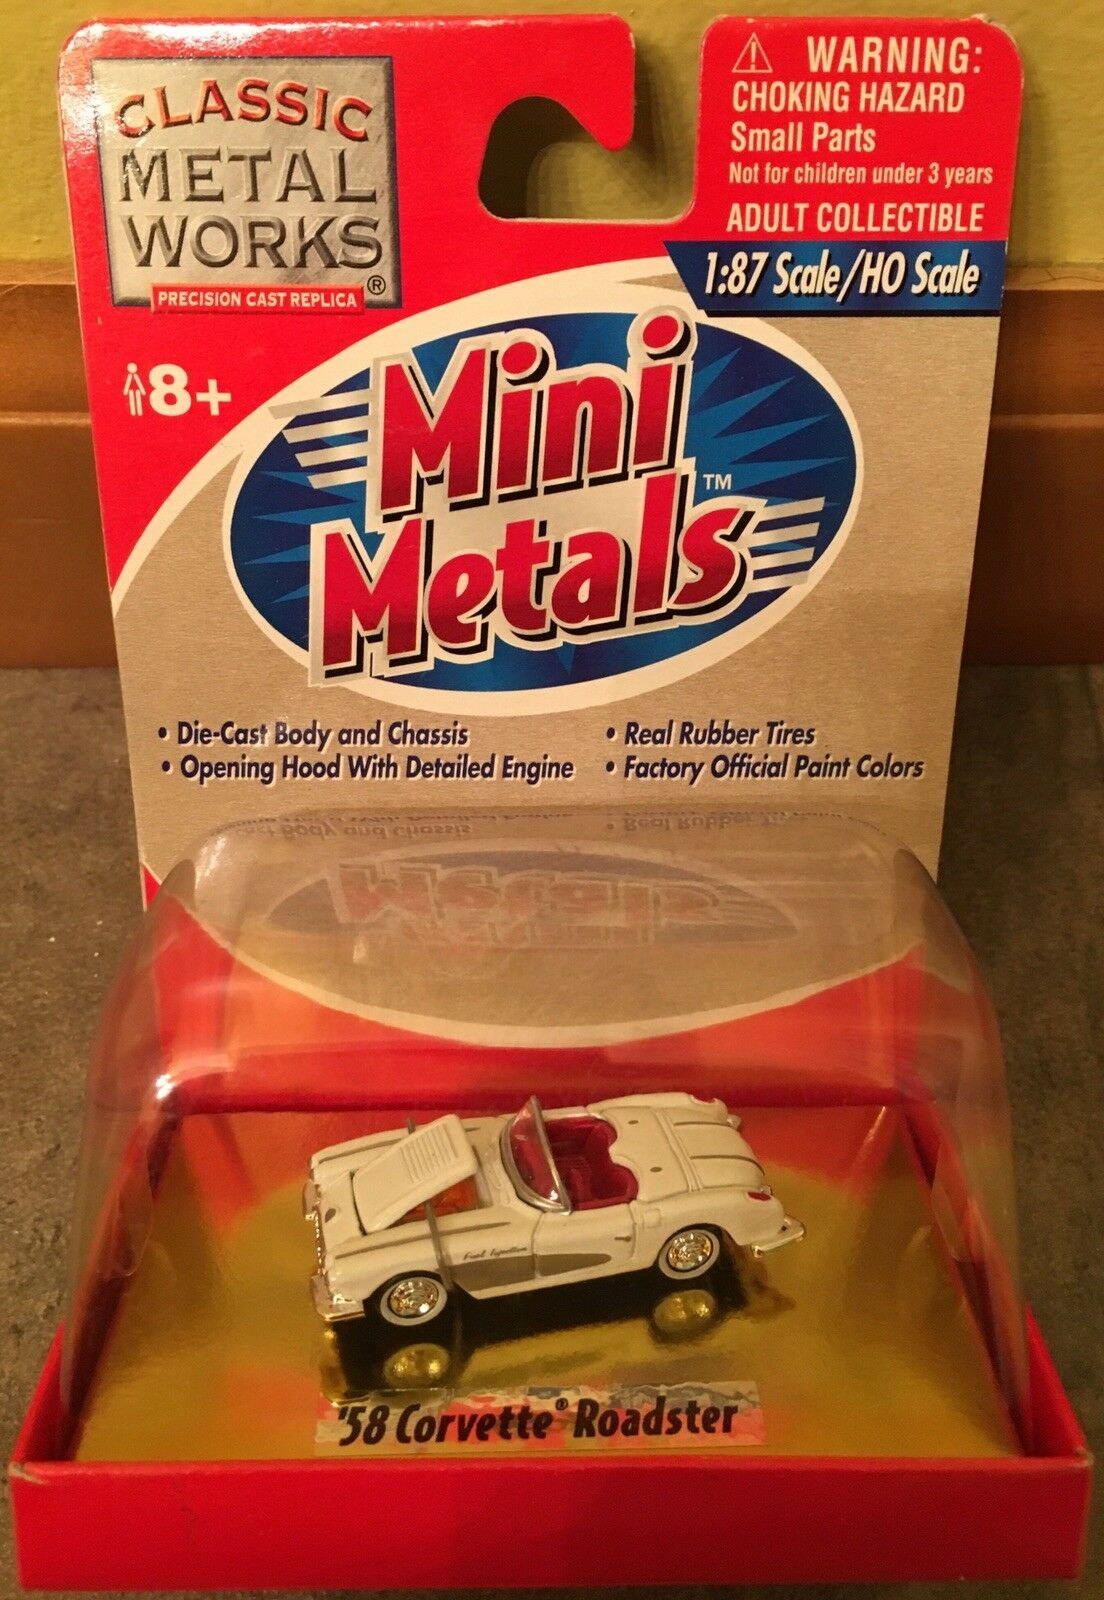 Seltene klassiker metall arbeitet 30140 58er corvette cabrio - mini - metalle